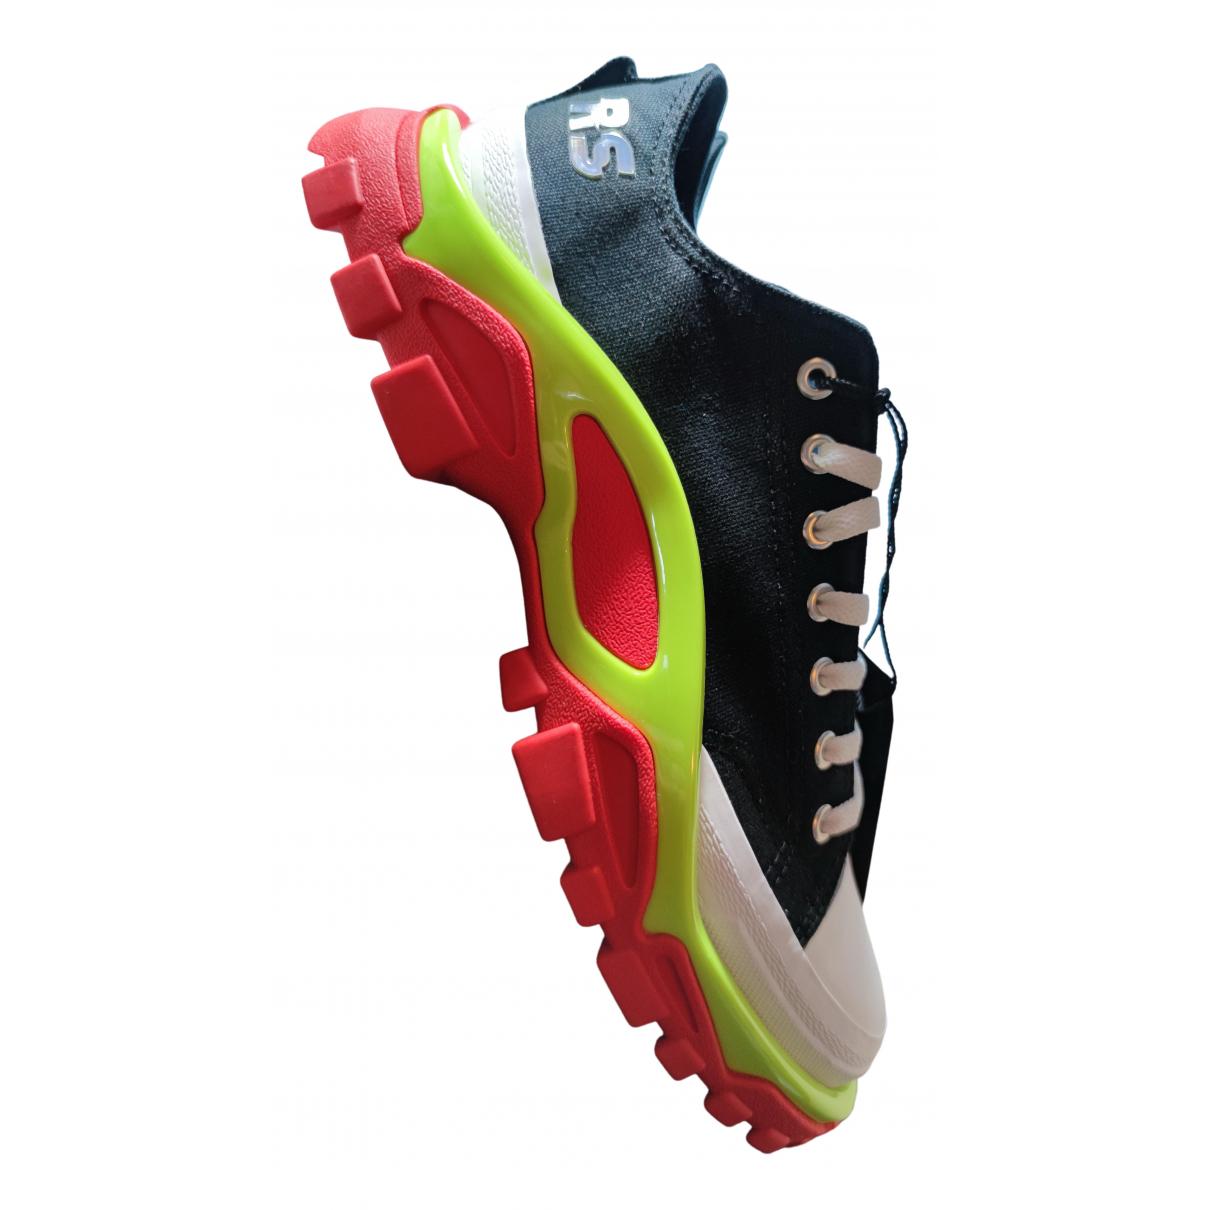 Adidas X Raf Simons Detroit Runner Sneakers in  Bunt Leinen